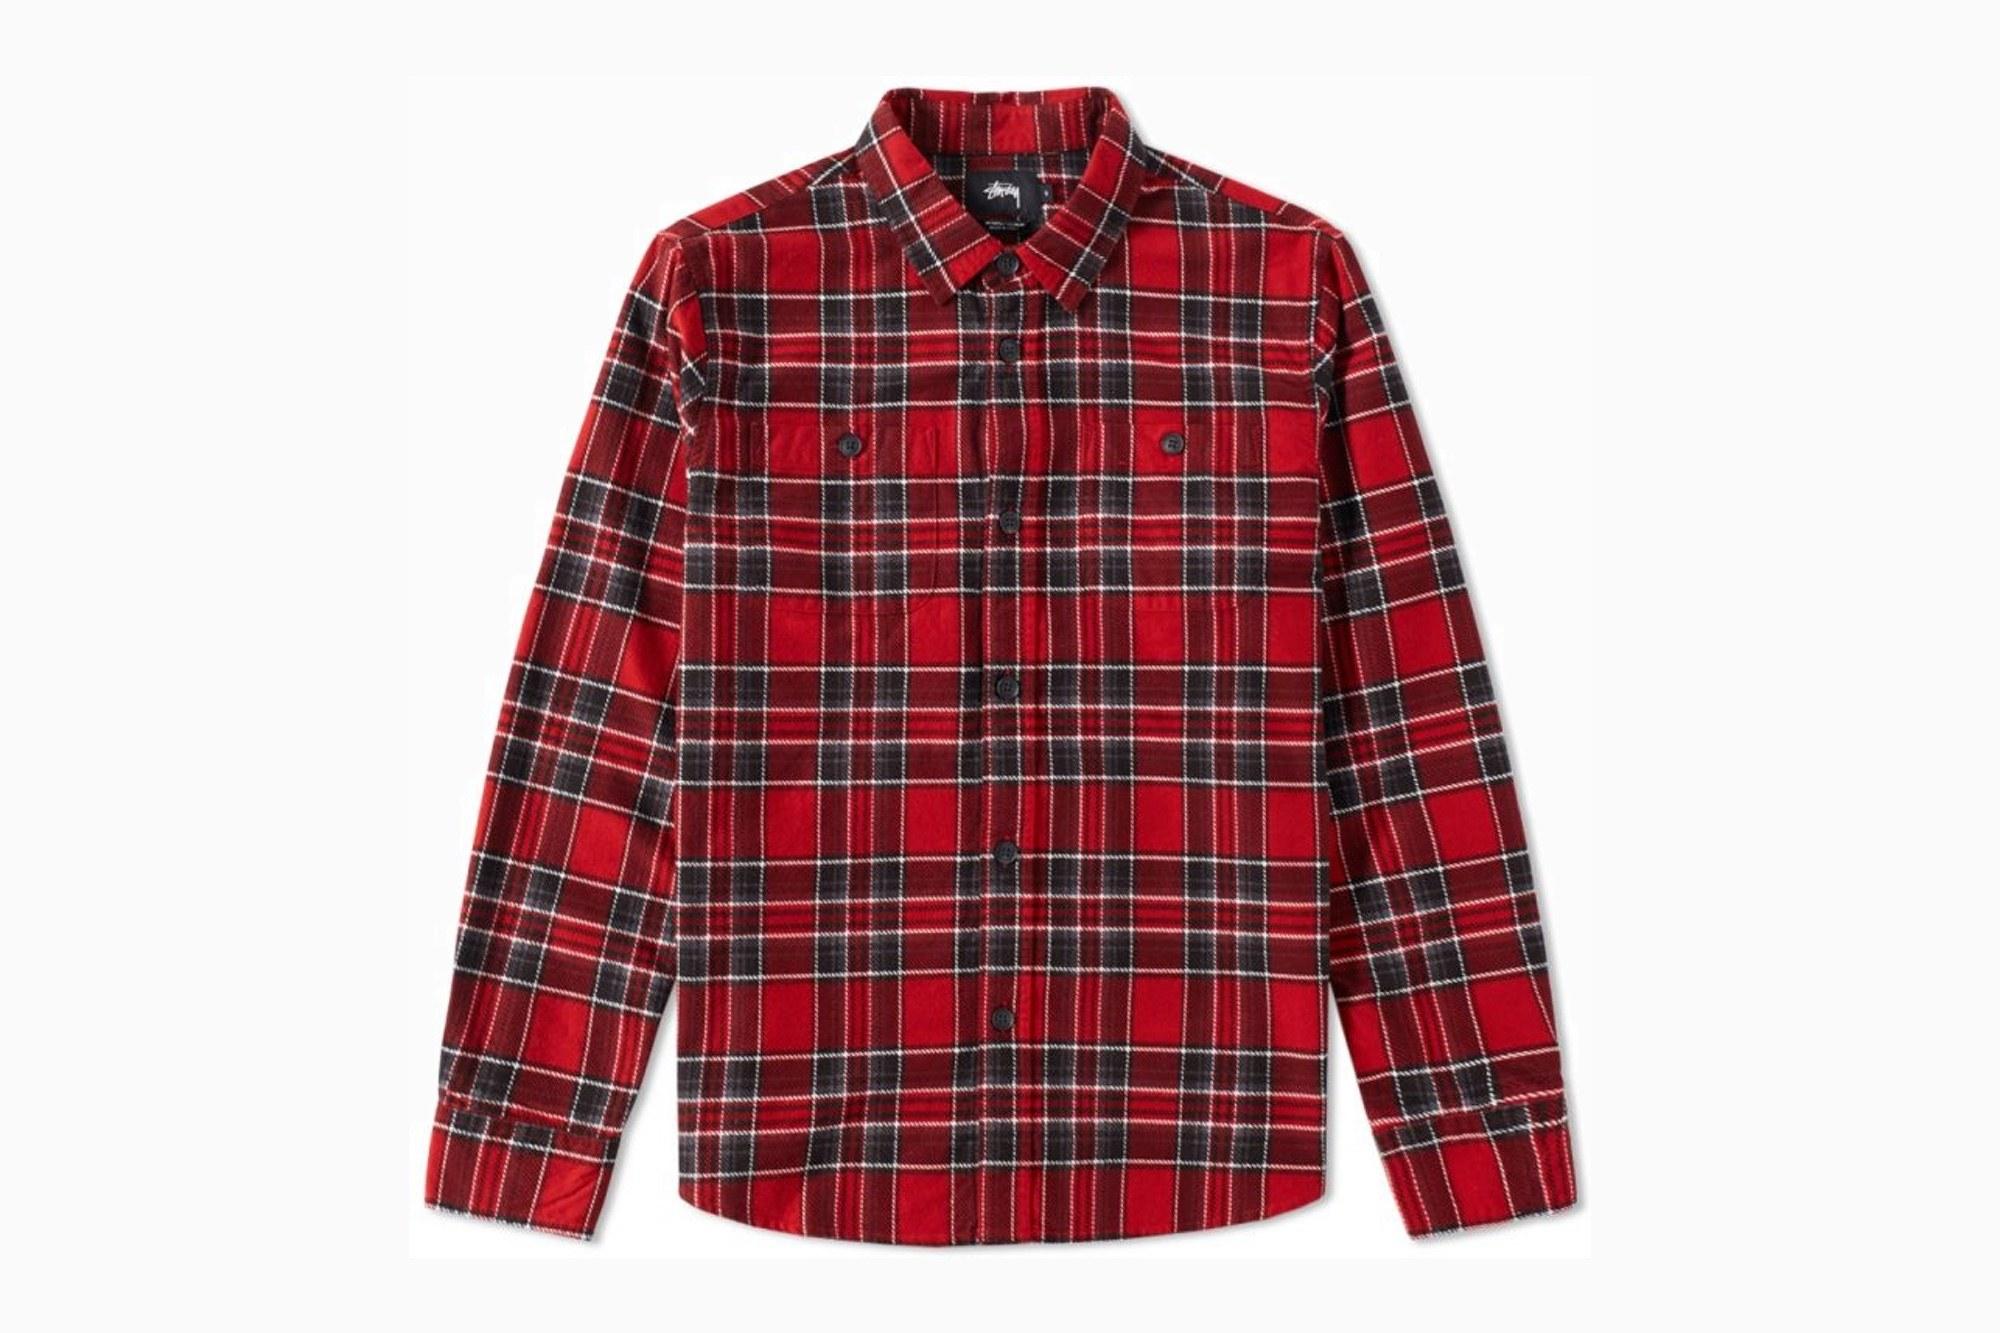 plaid shirts stussy double brush flannel shirt (was $155) VOALATI